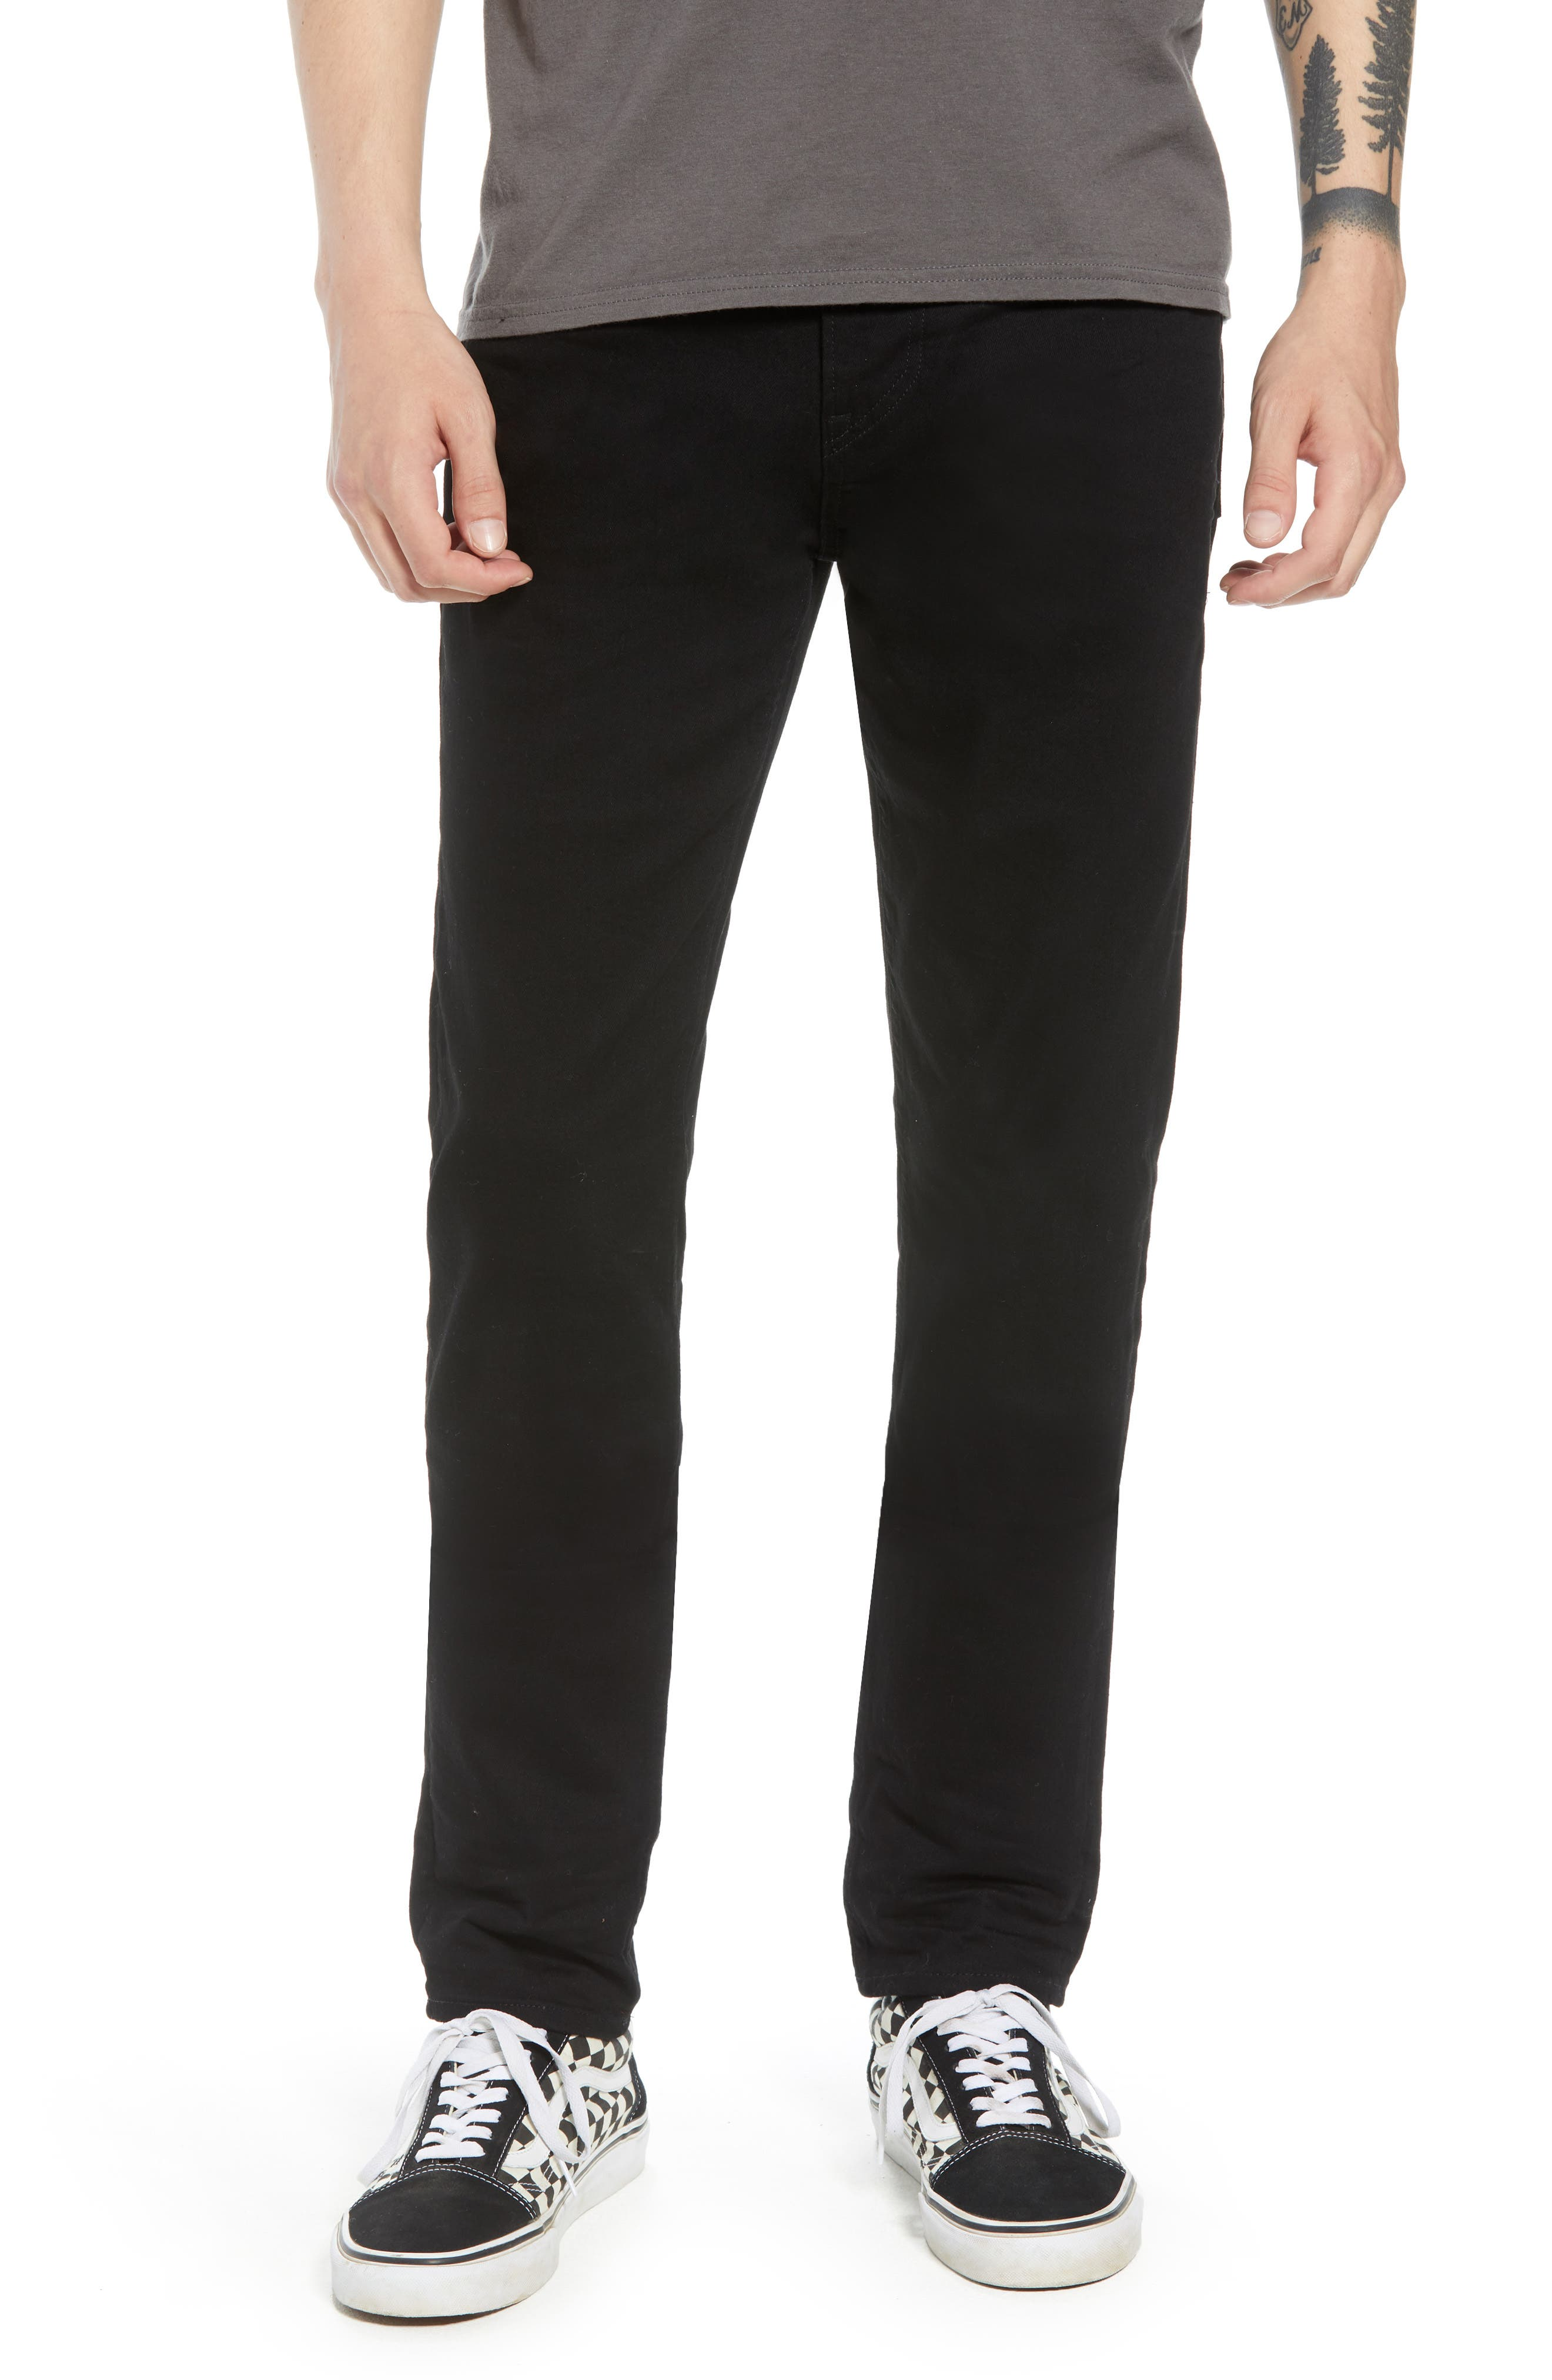 HUDSON JEANS, Hudson Axl Skinny Fit Jeans, Main thumbnail 1, color, HASKETT